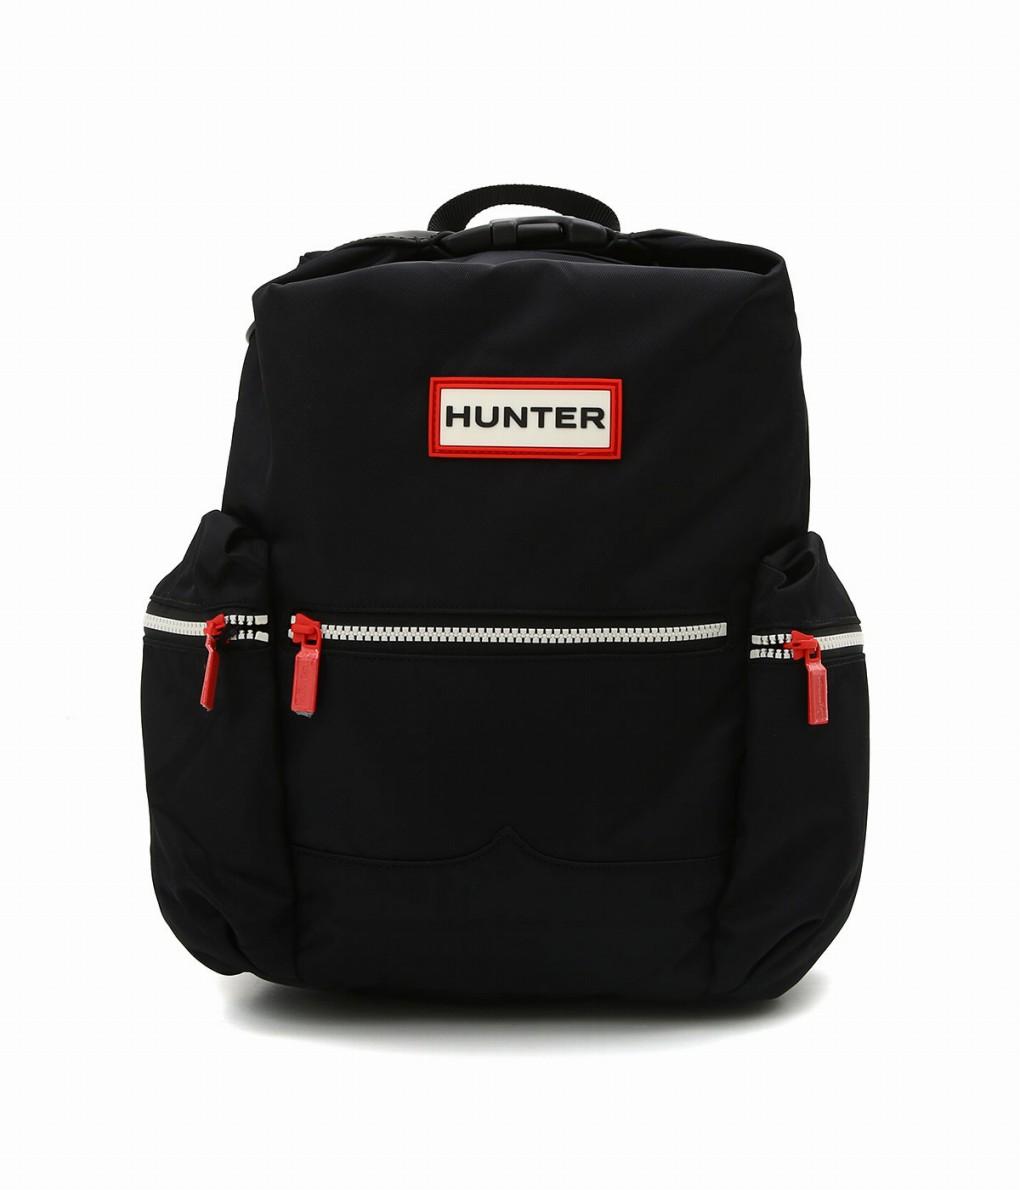 HUNTER / ハンター : 【レディース】ORIGINAL TOPCLIP MINI BACKPACK-WR NYLON : ハンター オリジナル トップクリップ バックパック バッグ レディース : UBB6018ACD 【DEA】